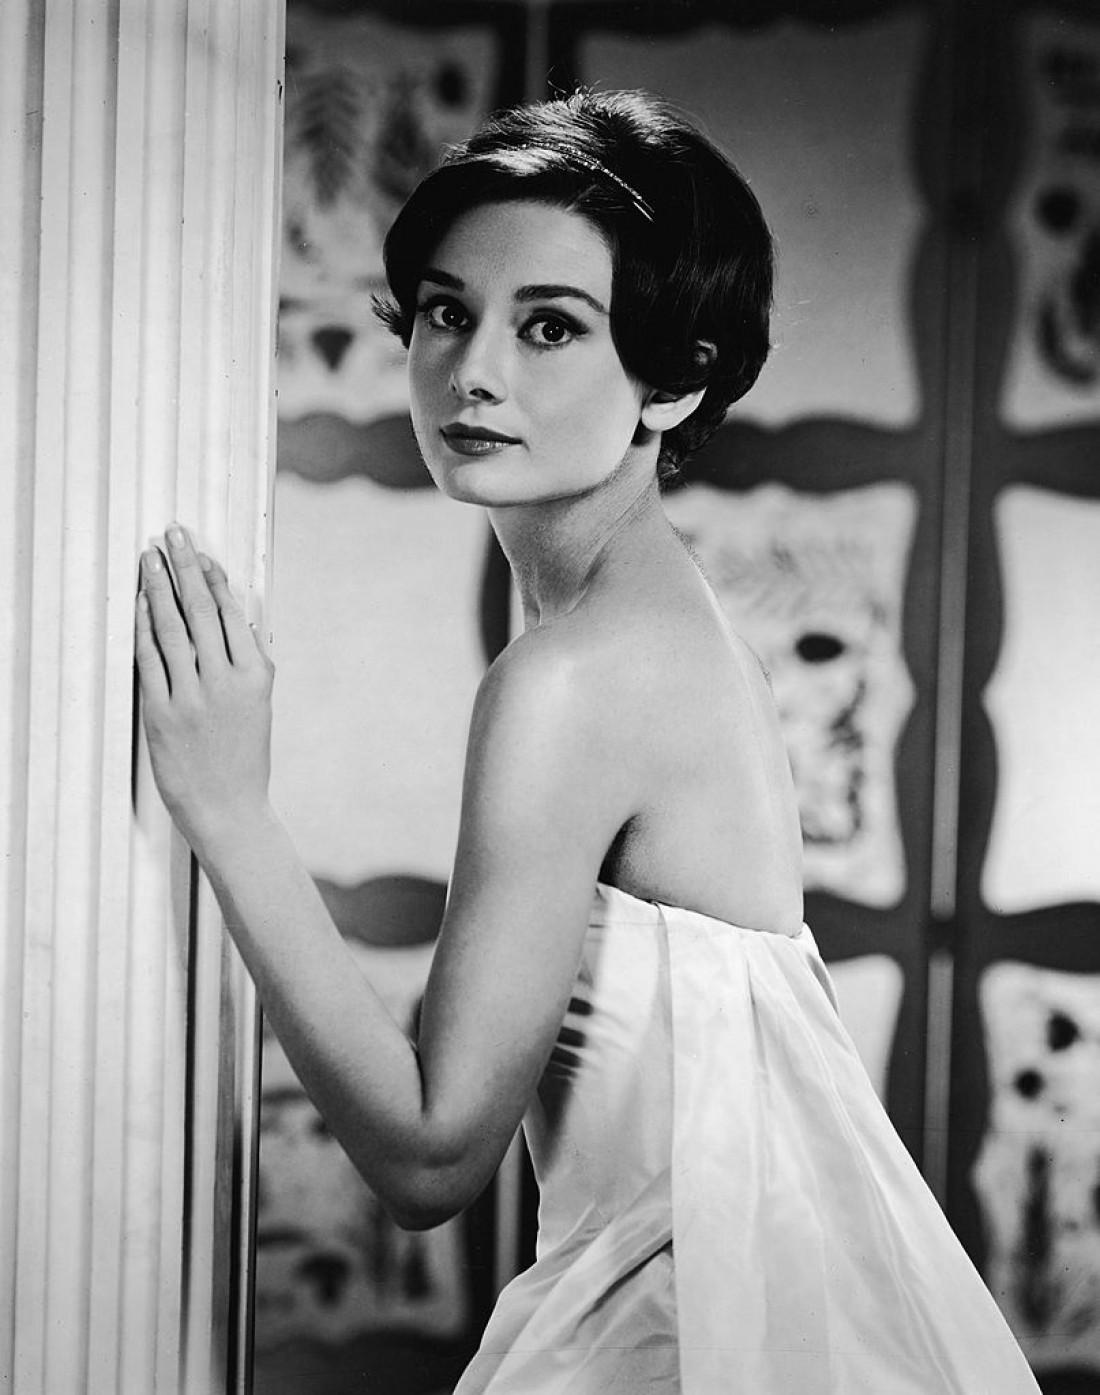 Диета Одри Хепберн: как питалась актриса